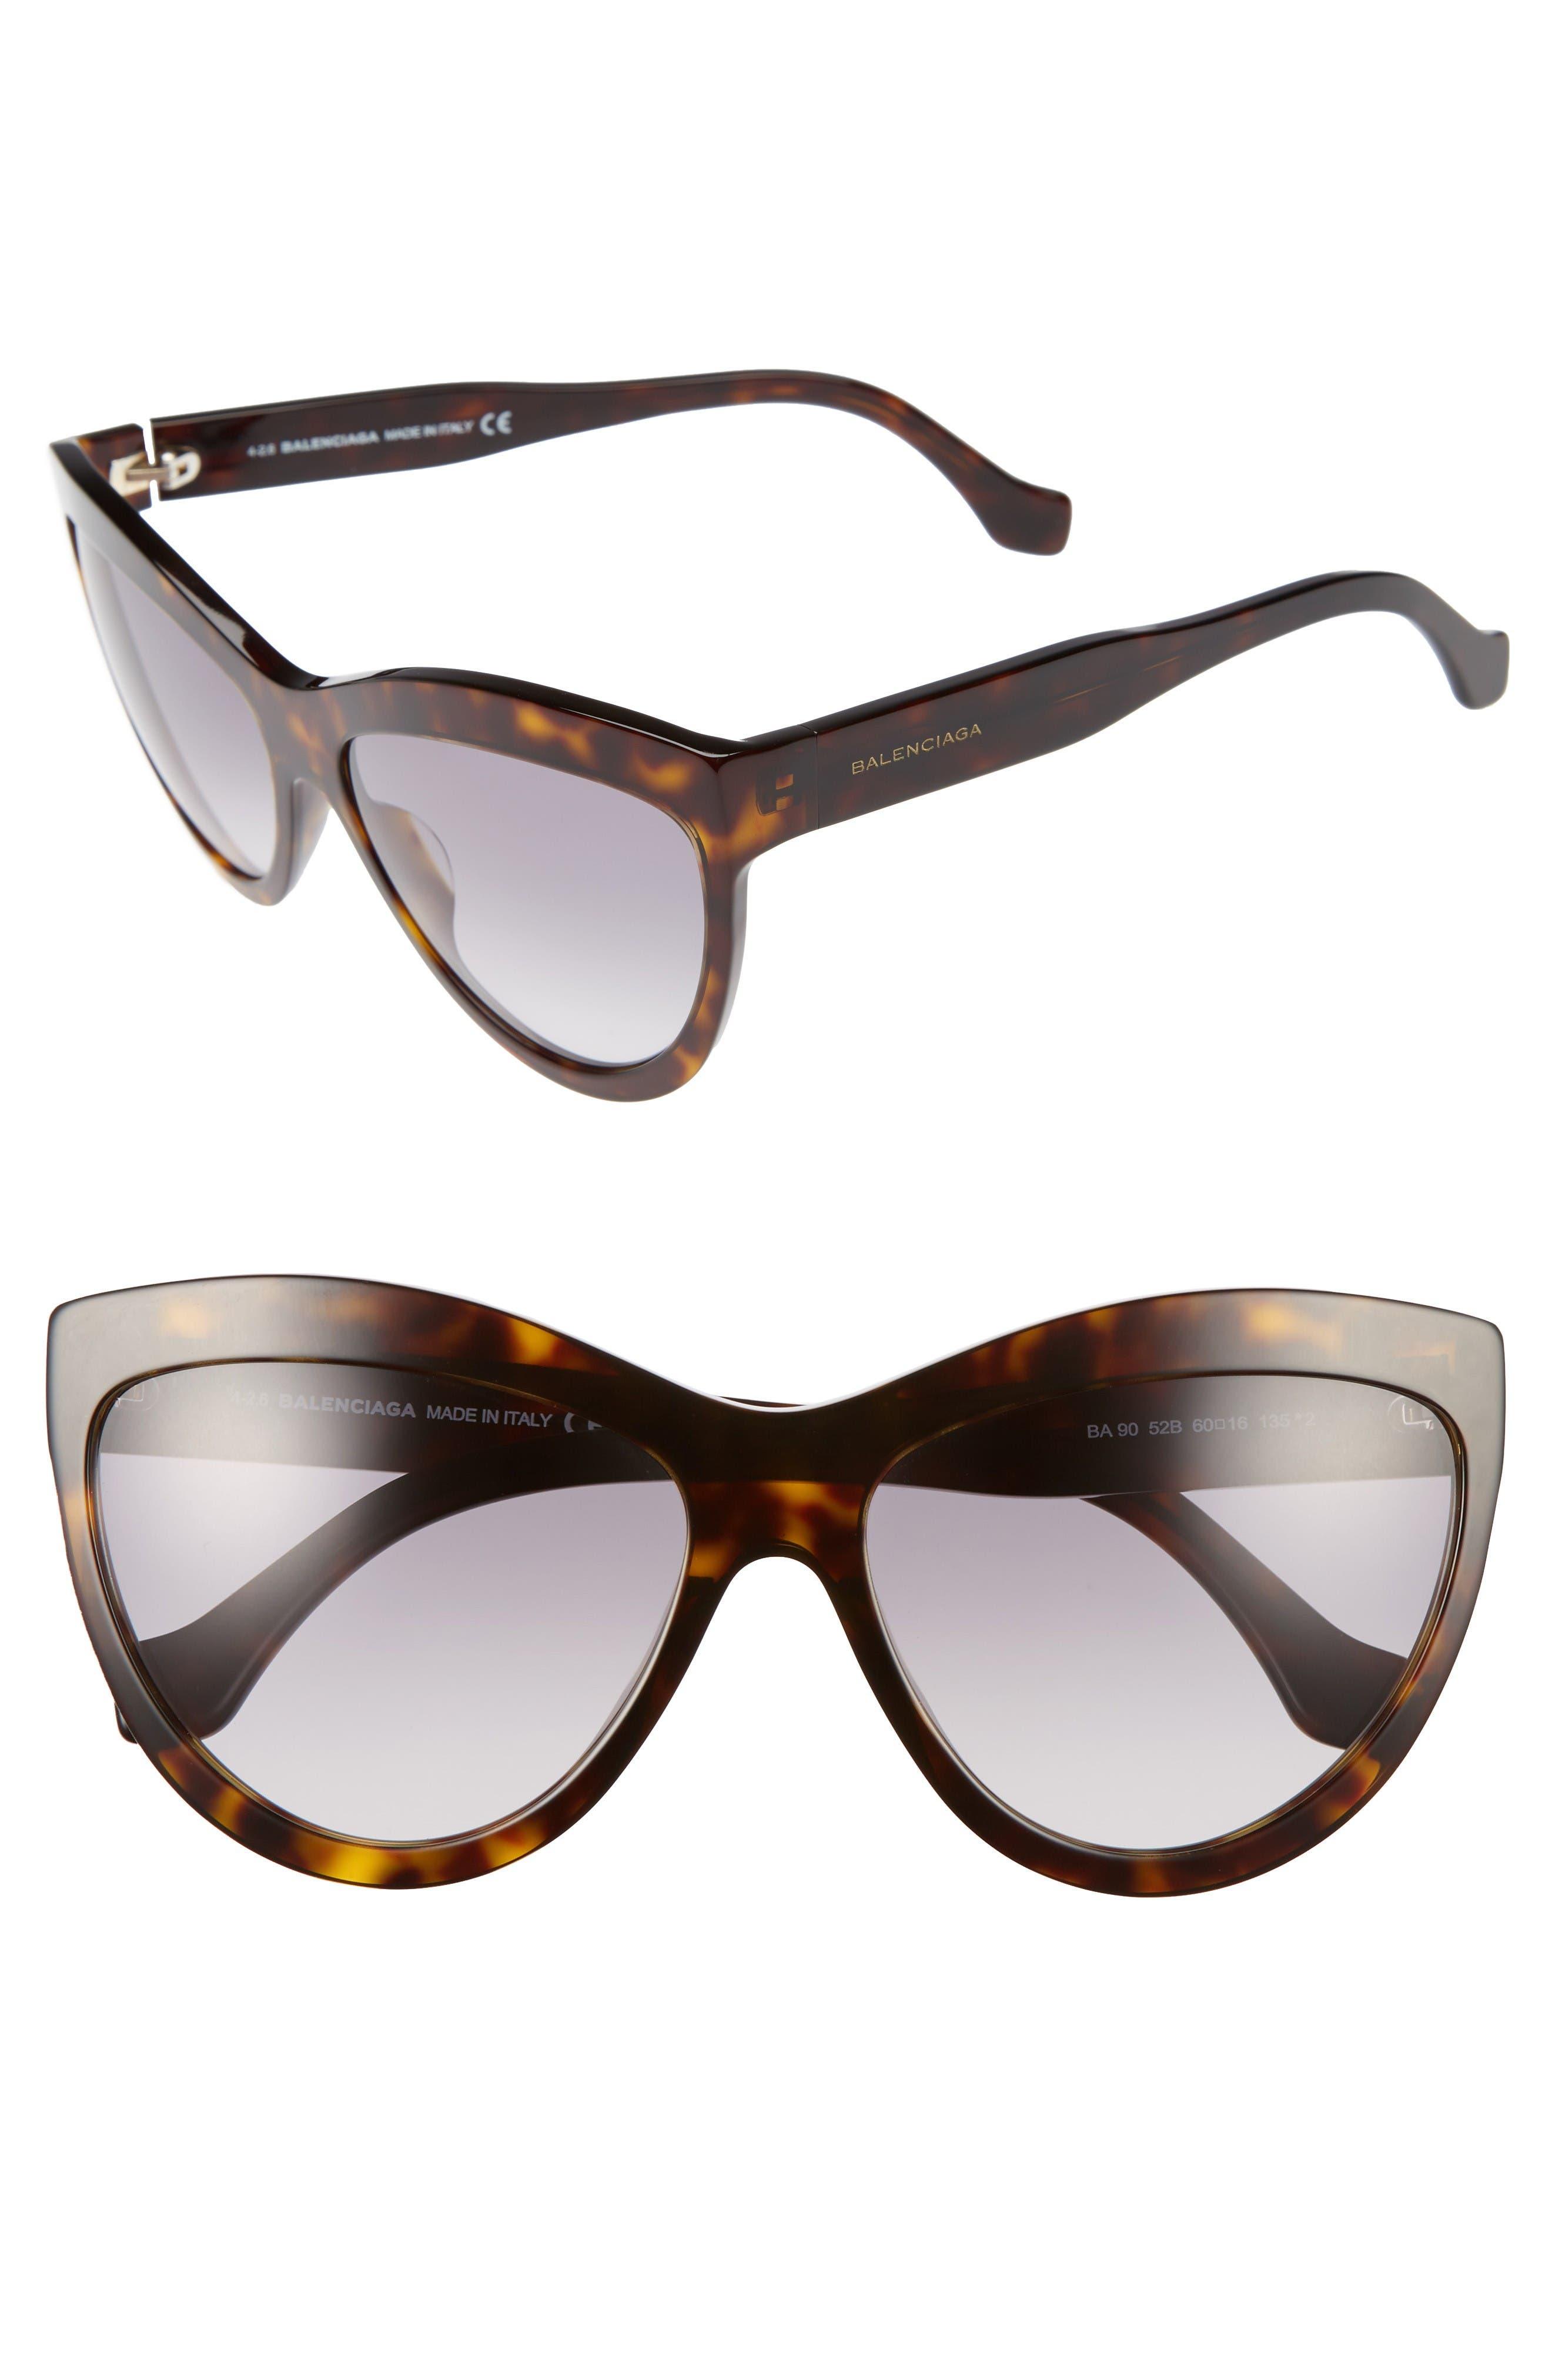 Alternate Image 1 Selected - Balenciaga 60mm Sunglasses